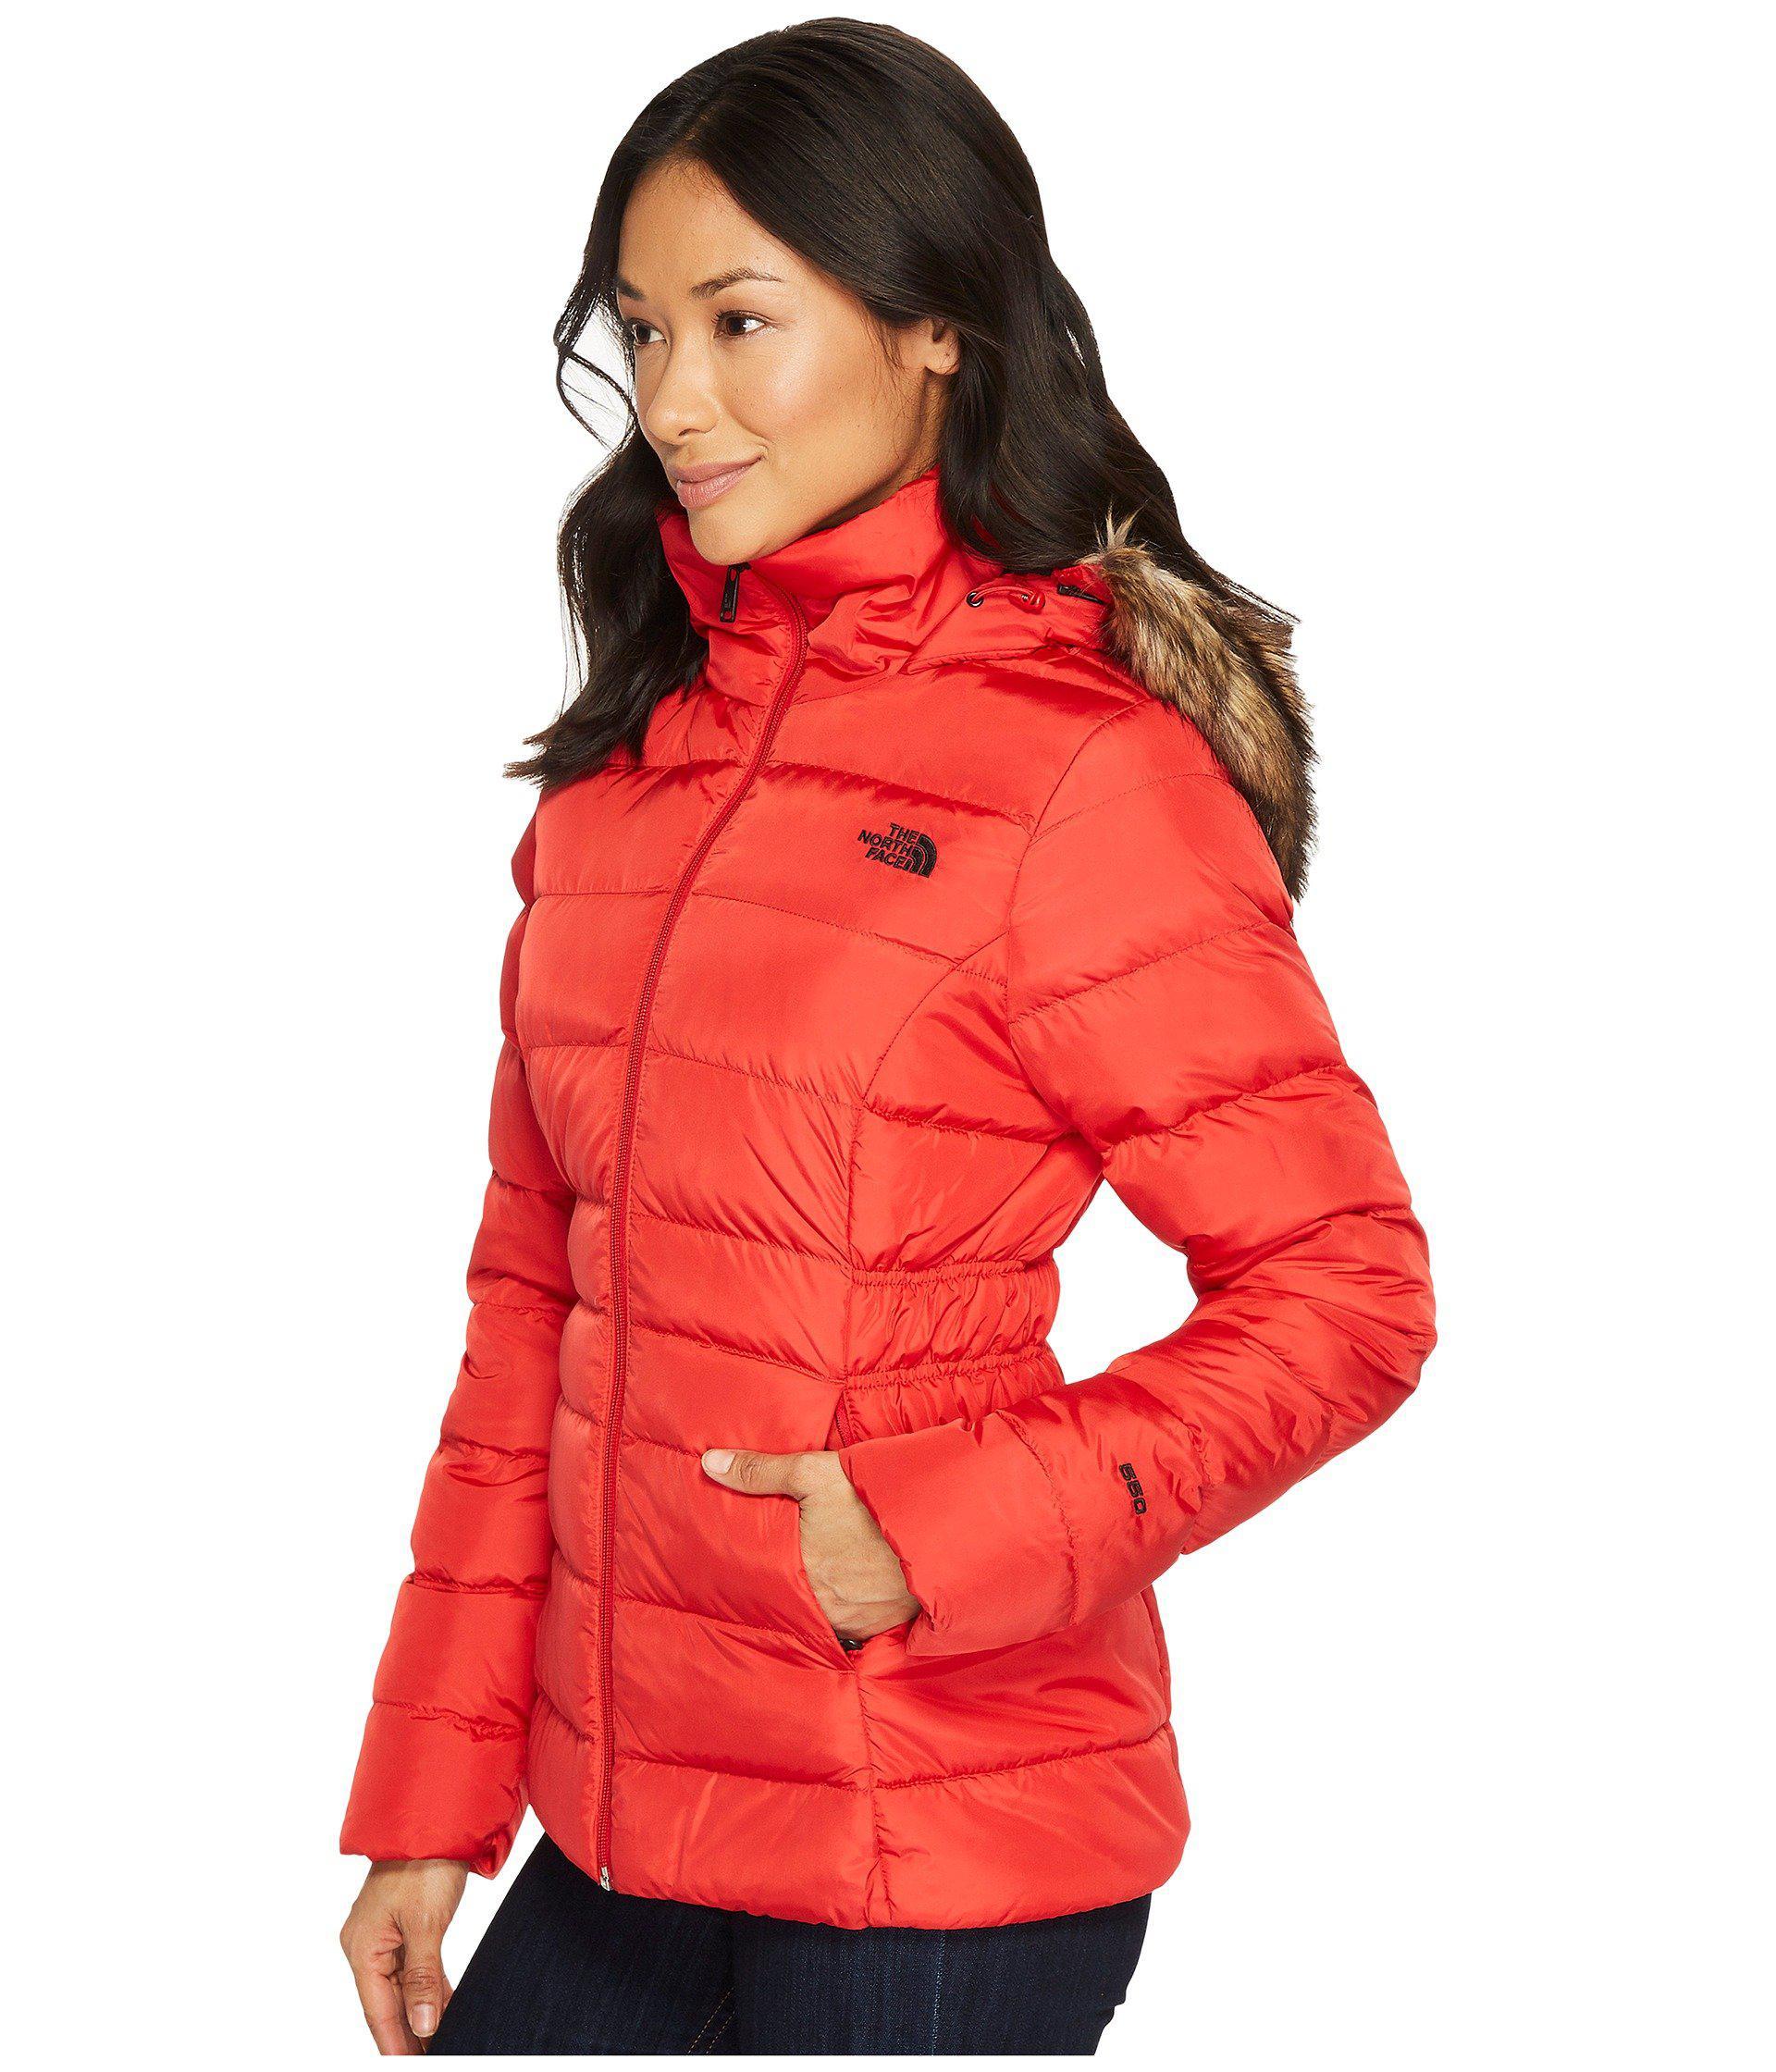 849c29ff8d Lyst - The North Face Gotham Jacket Ii (metallic Copper) Women s Coat in Red